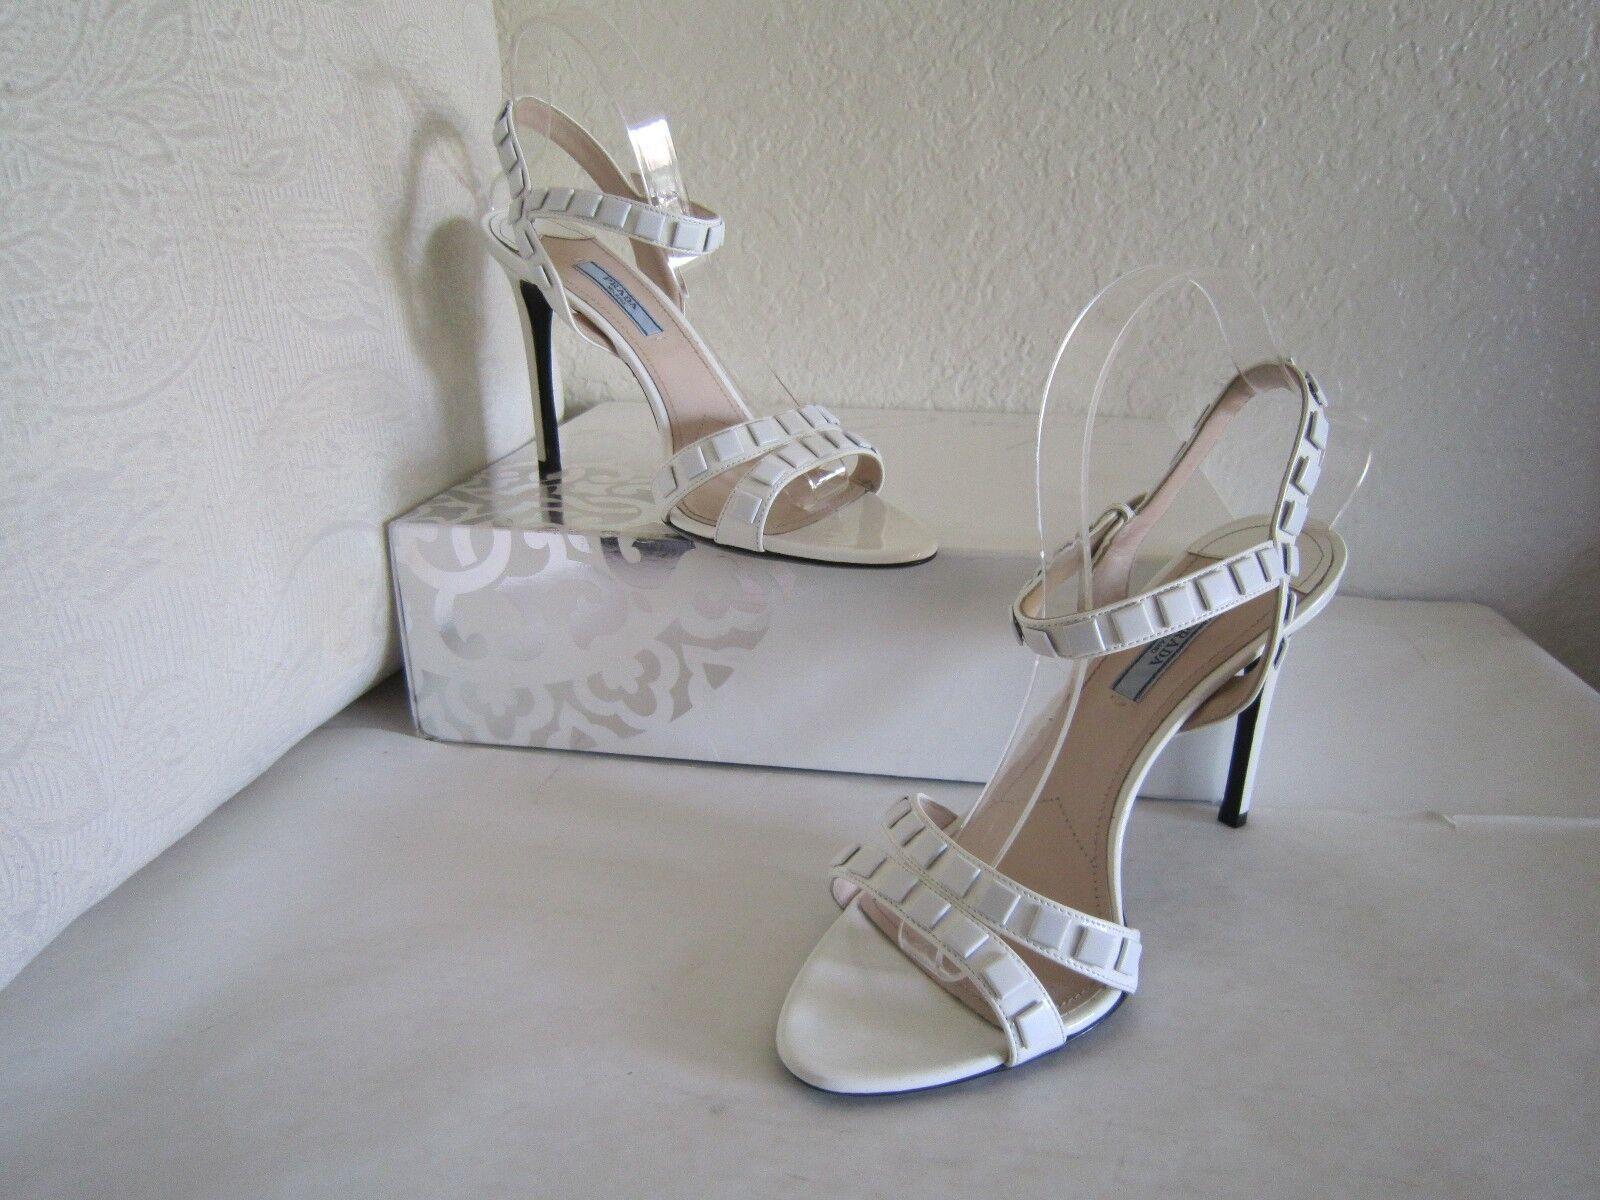 Prada White Studded Patent Strappy Sandals   Size 40 US 10